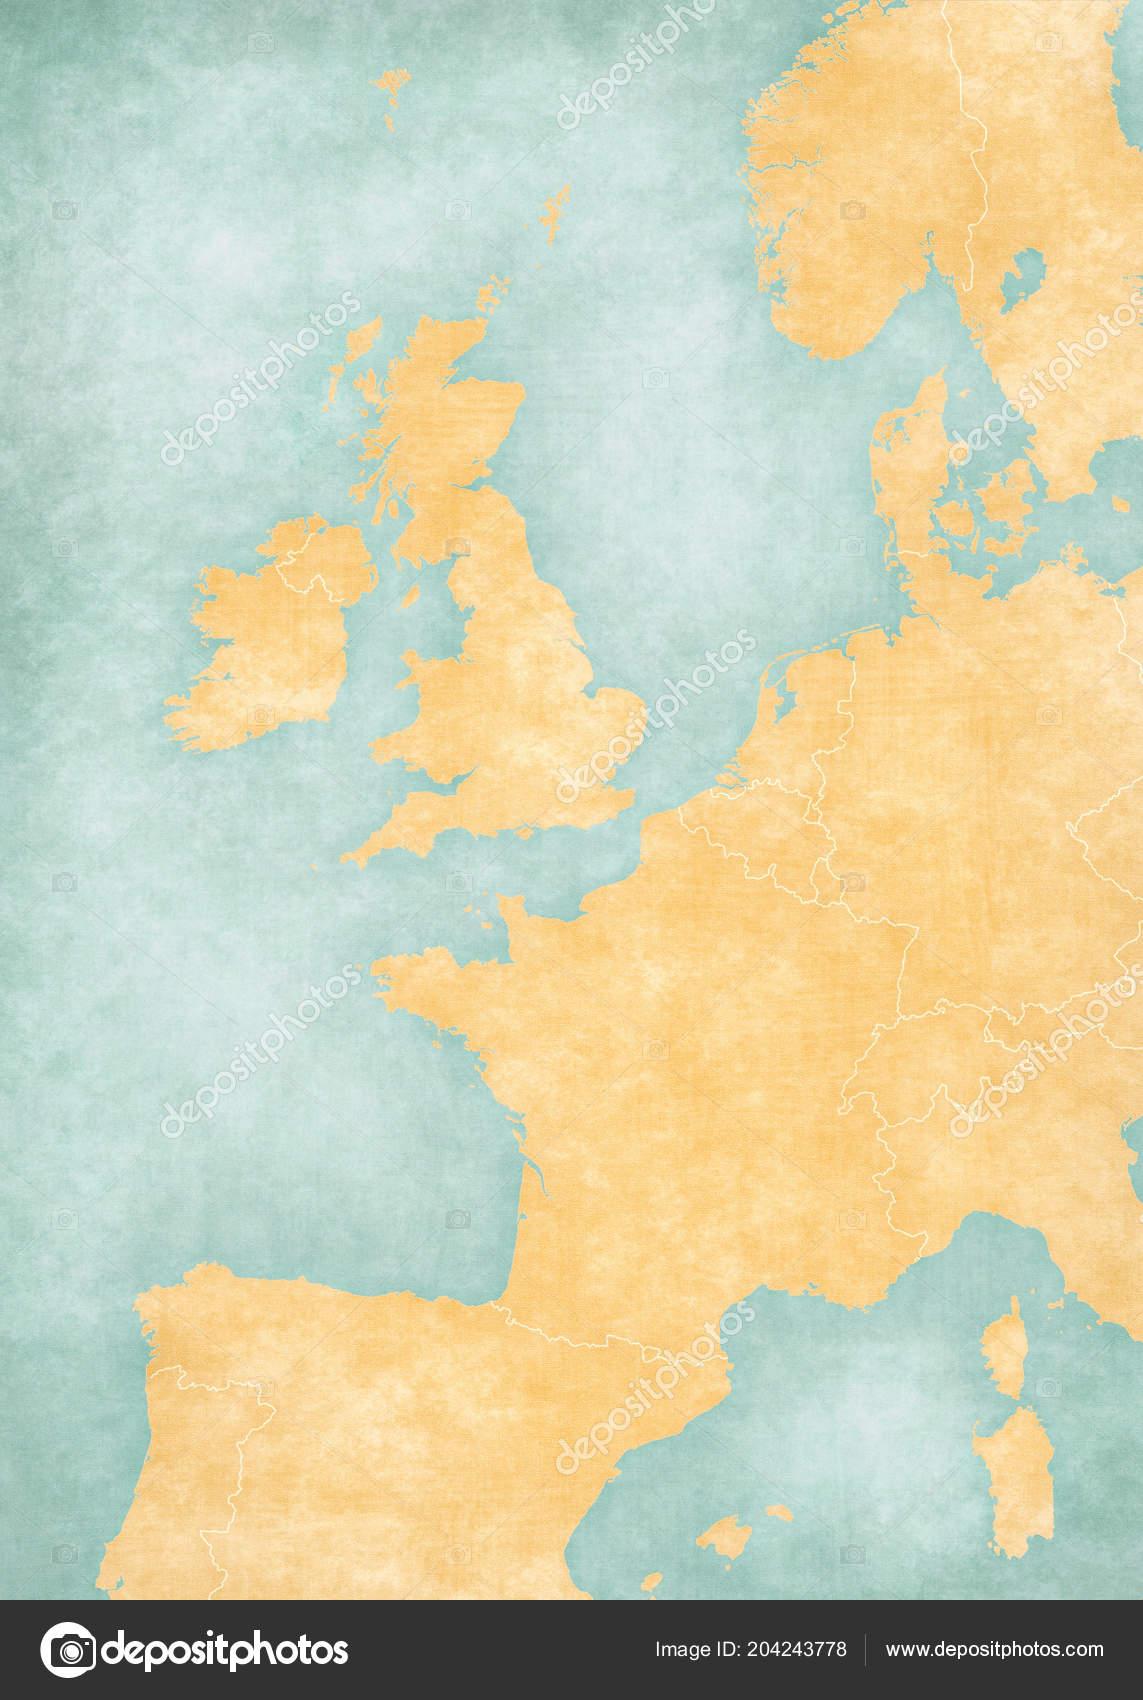 Image of: Blank Map Western Europe Country Borders Soft Grunge Vintage Style Stock Photo C Tindo 204243778